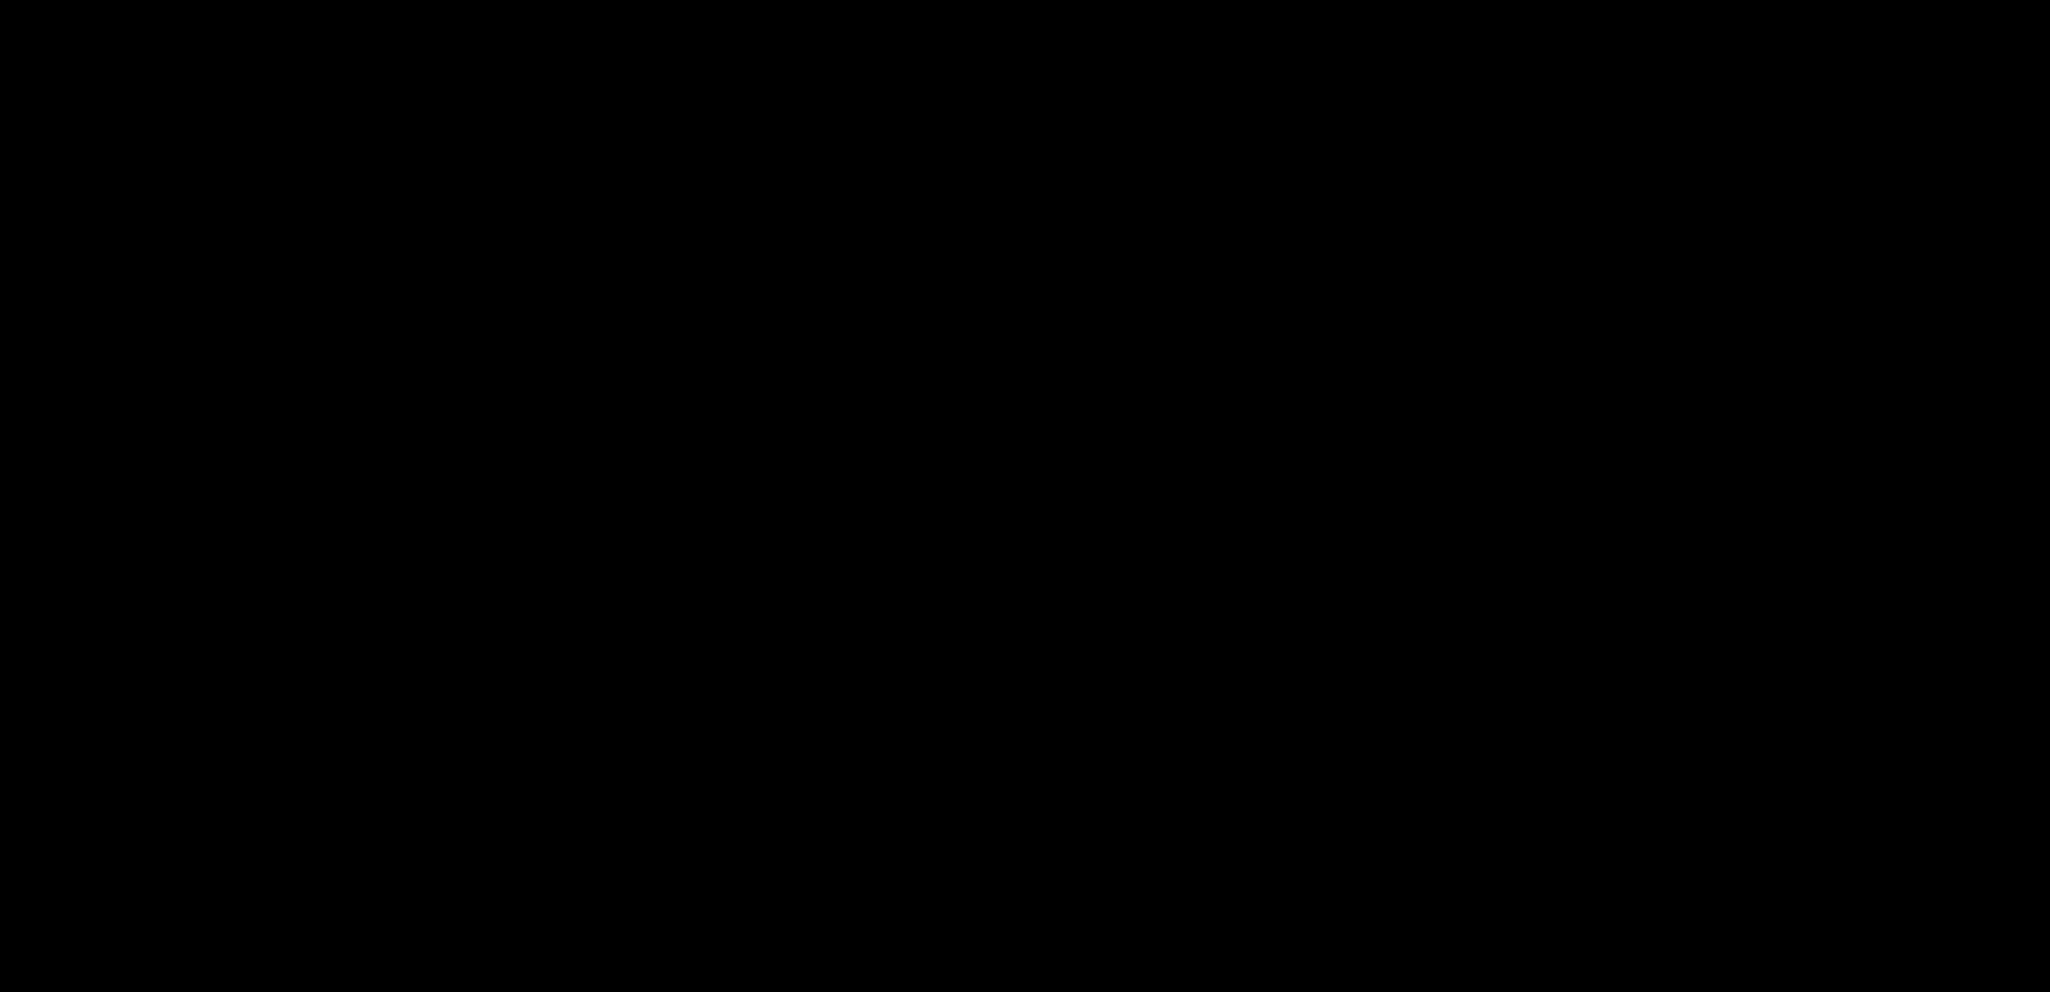 3-Dansyl estradiol